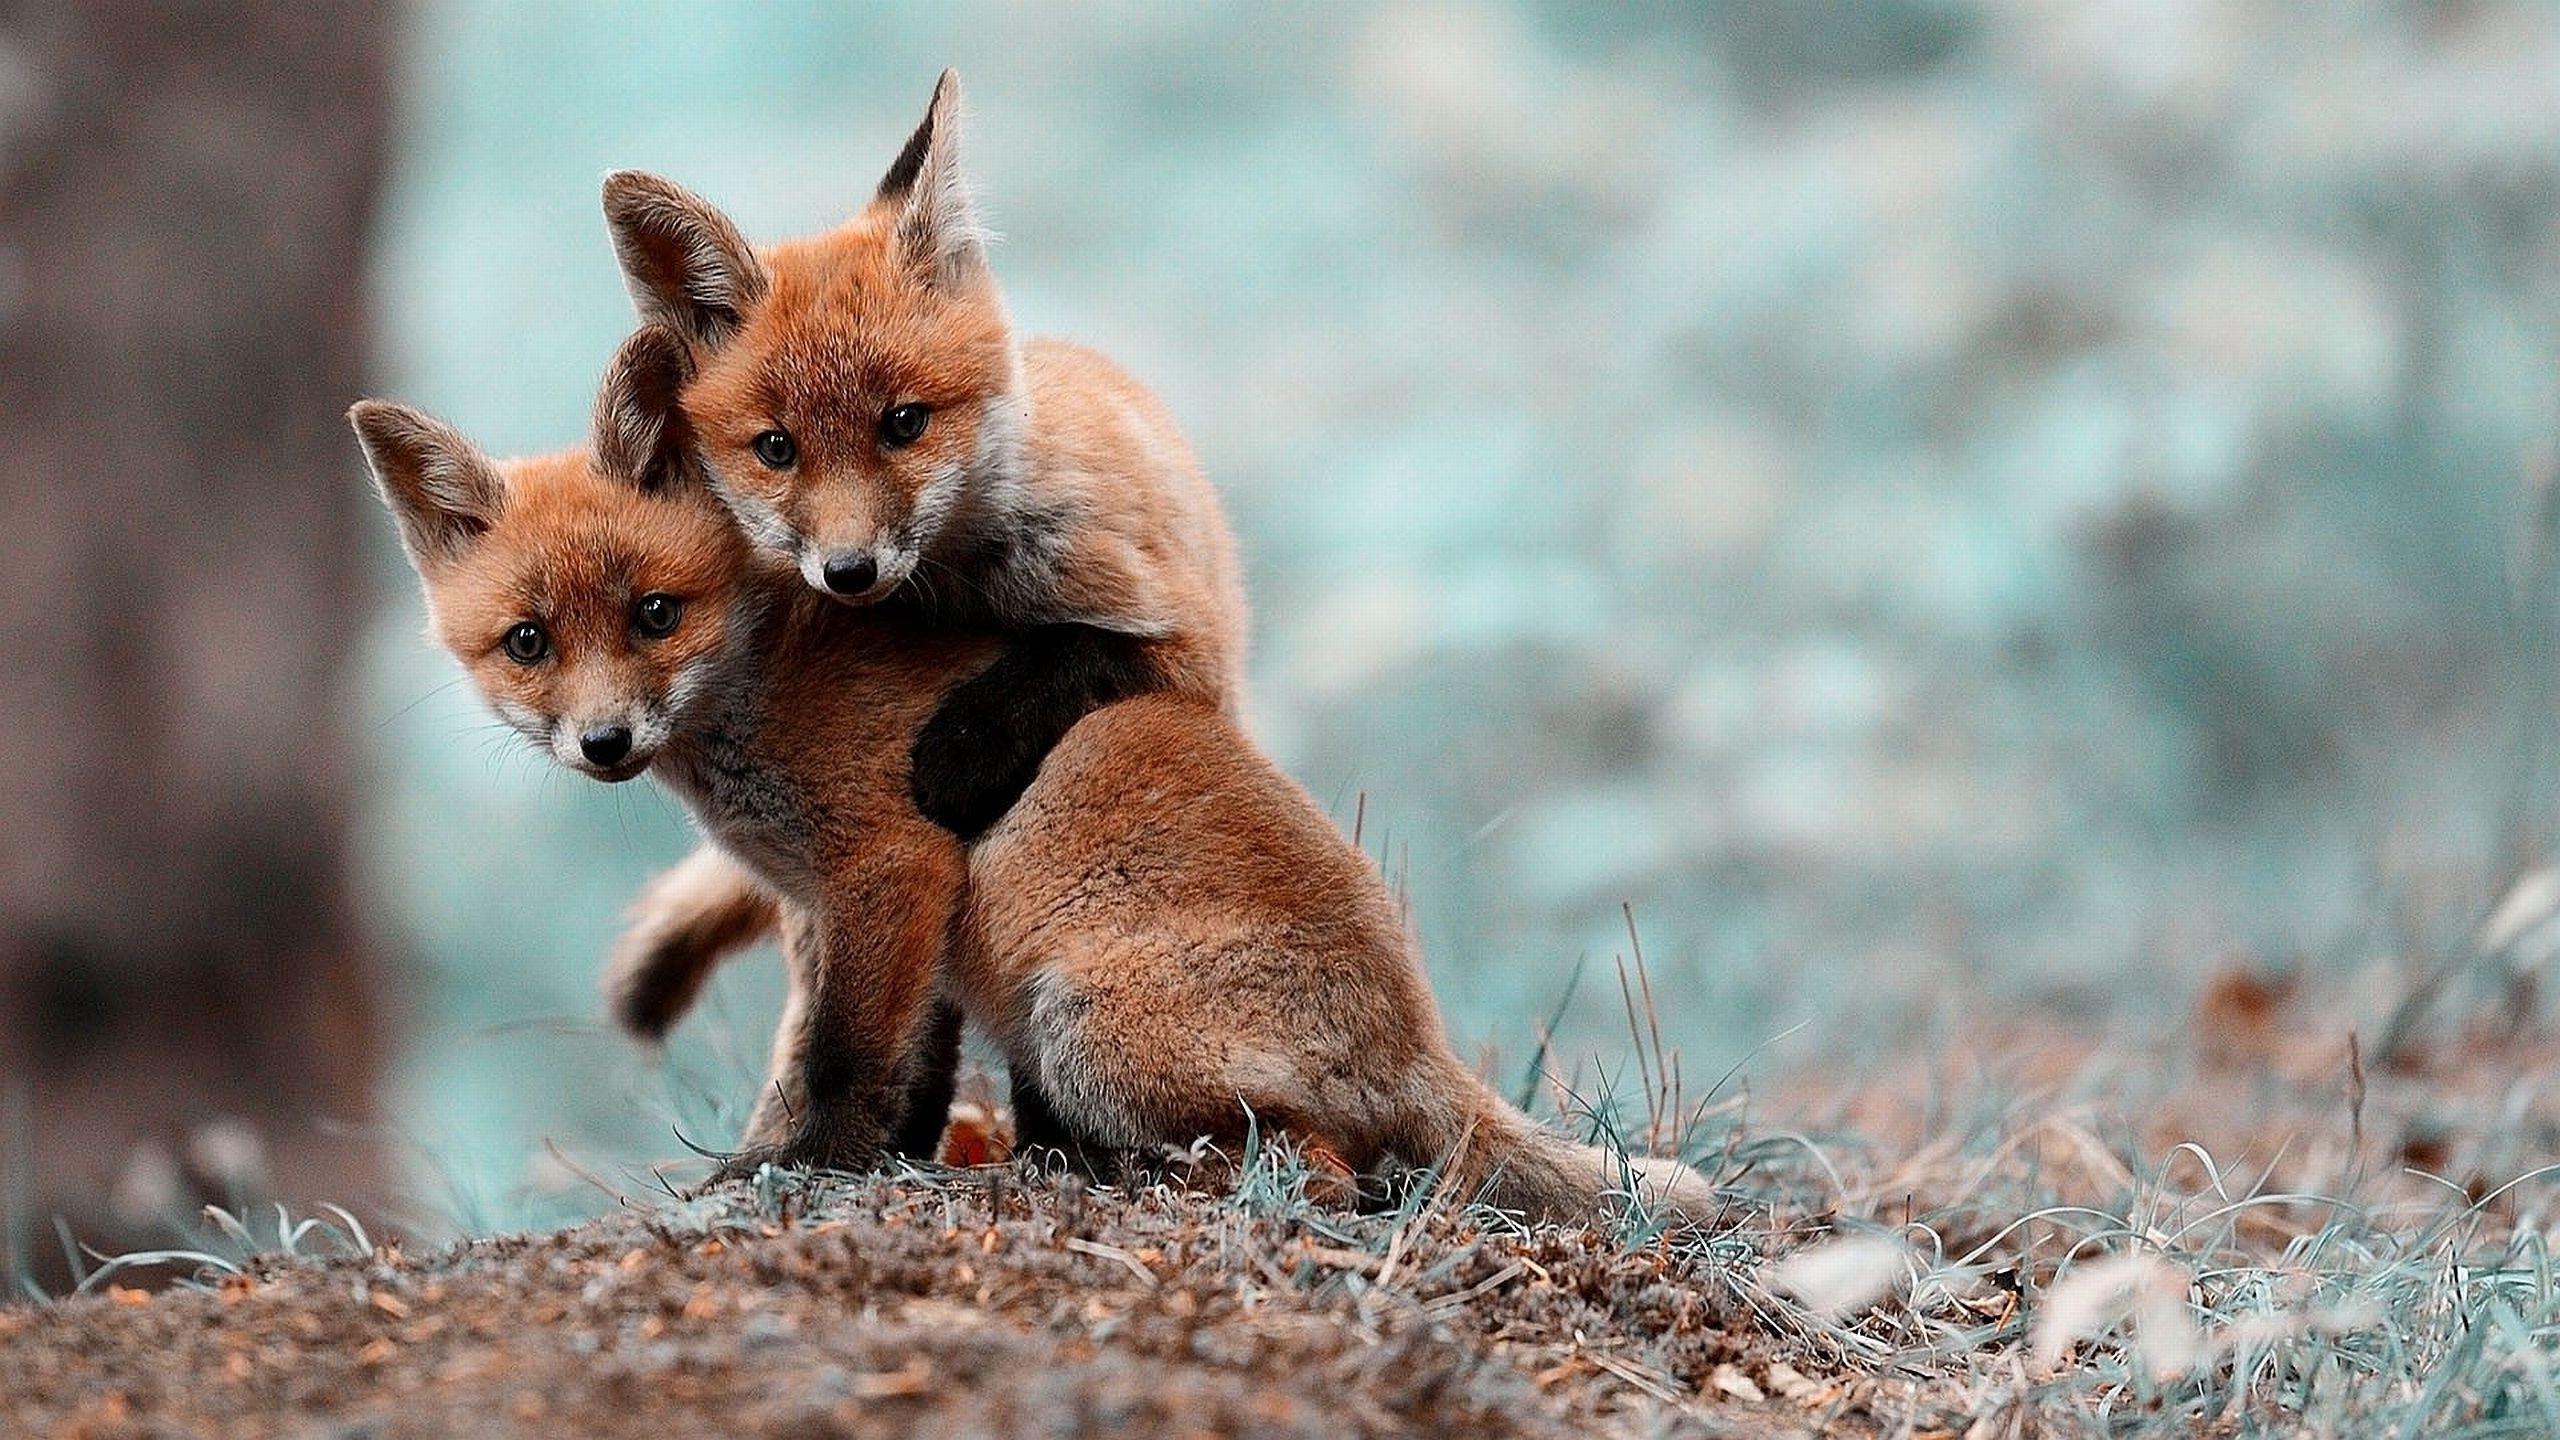 Spring Baby Animals Desktop Wallpapers (48+ images)